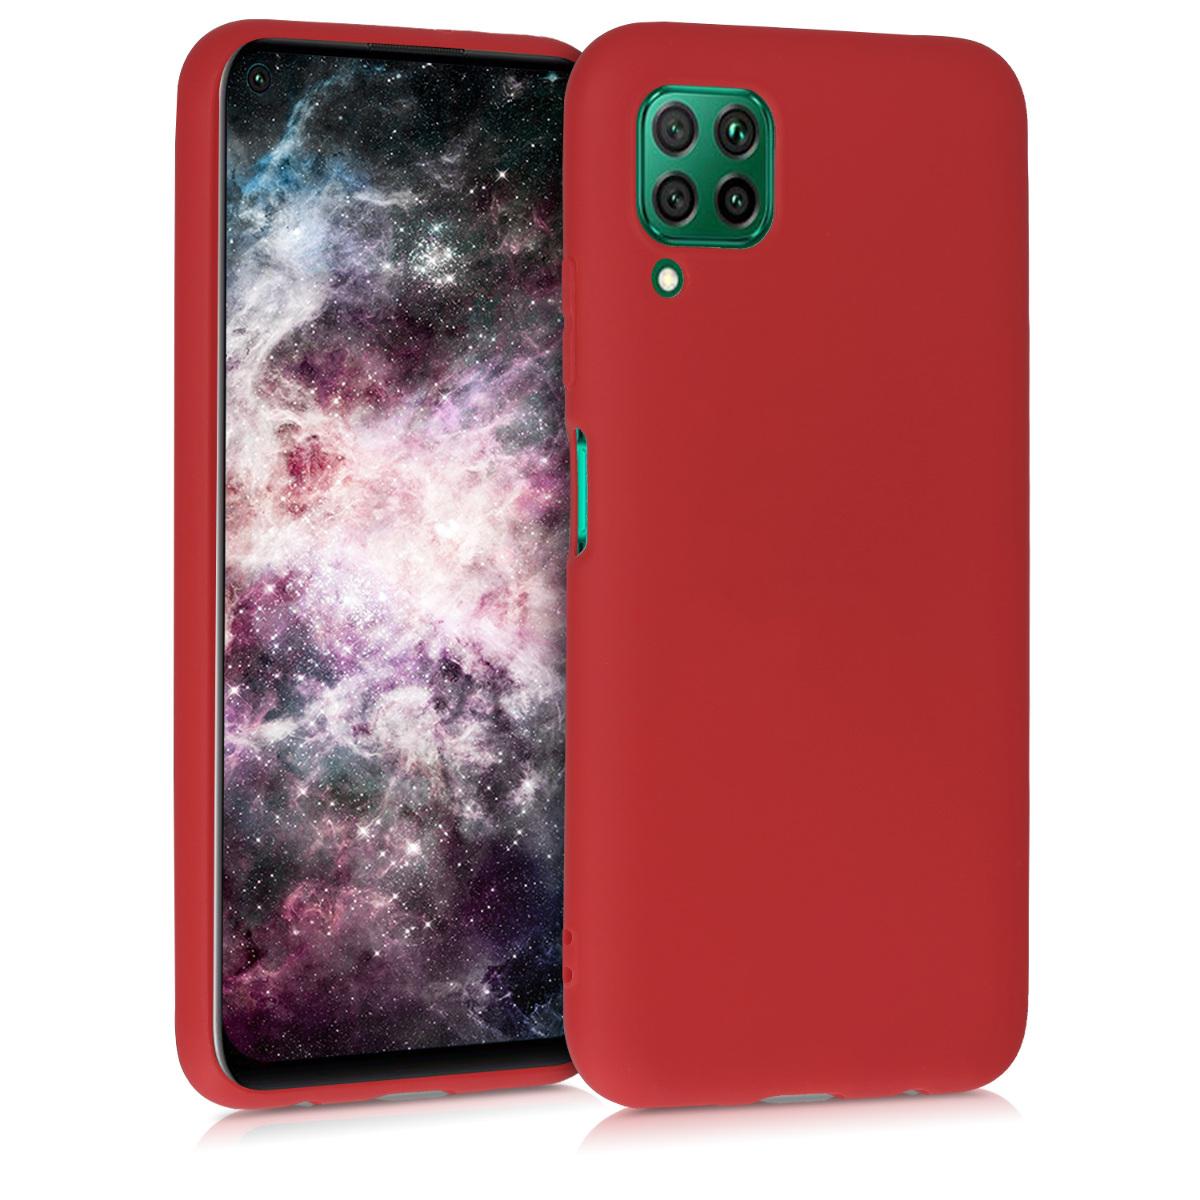 KW Θήκη Σιλικόνης Huawei P40 Lite - Dark Red (51519.20)